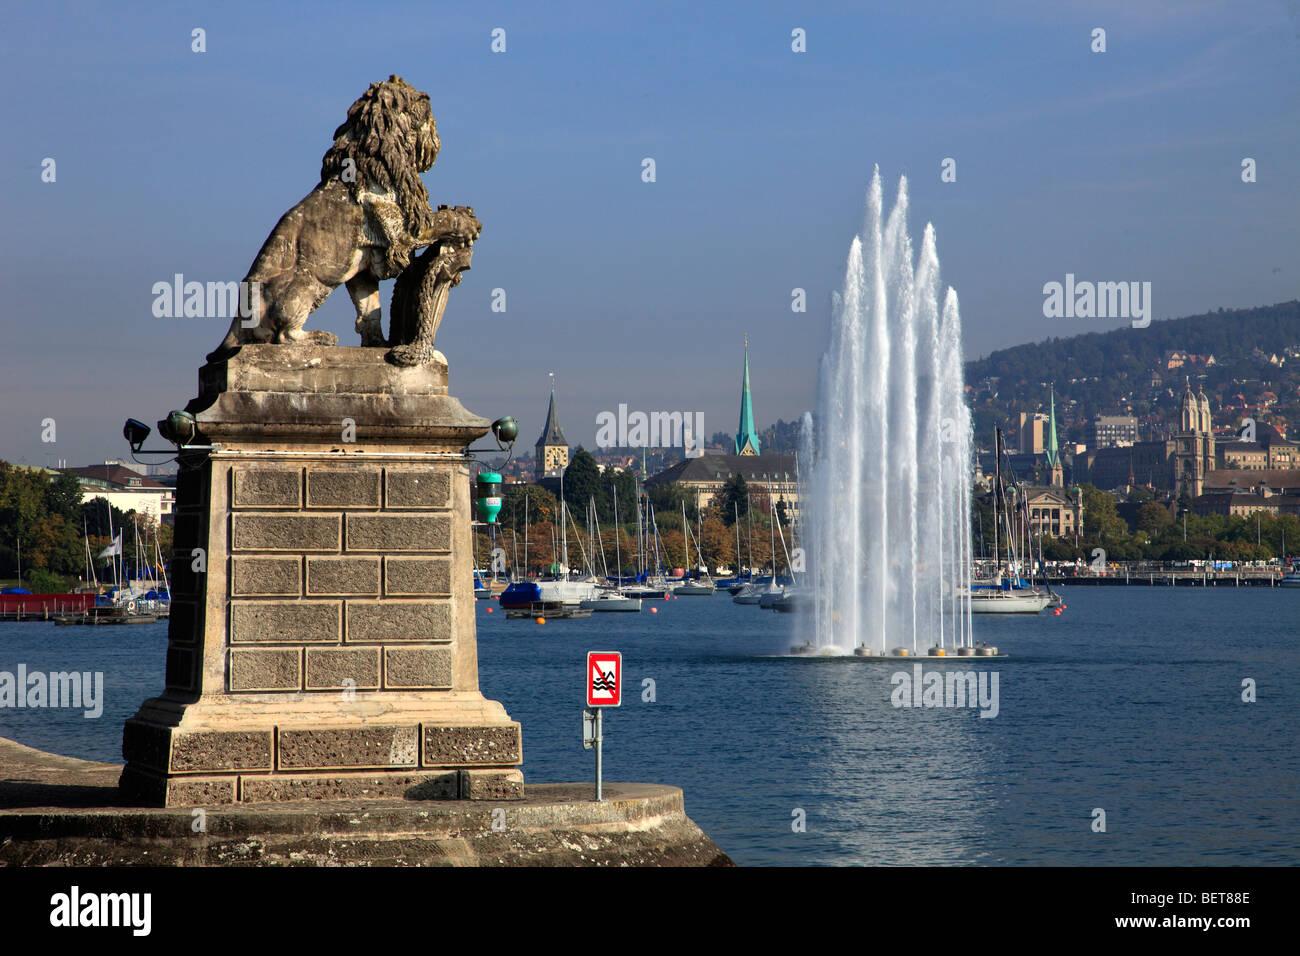 Switzerland, Zurich, lake, fountain, harbor, general view - Stock Image